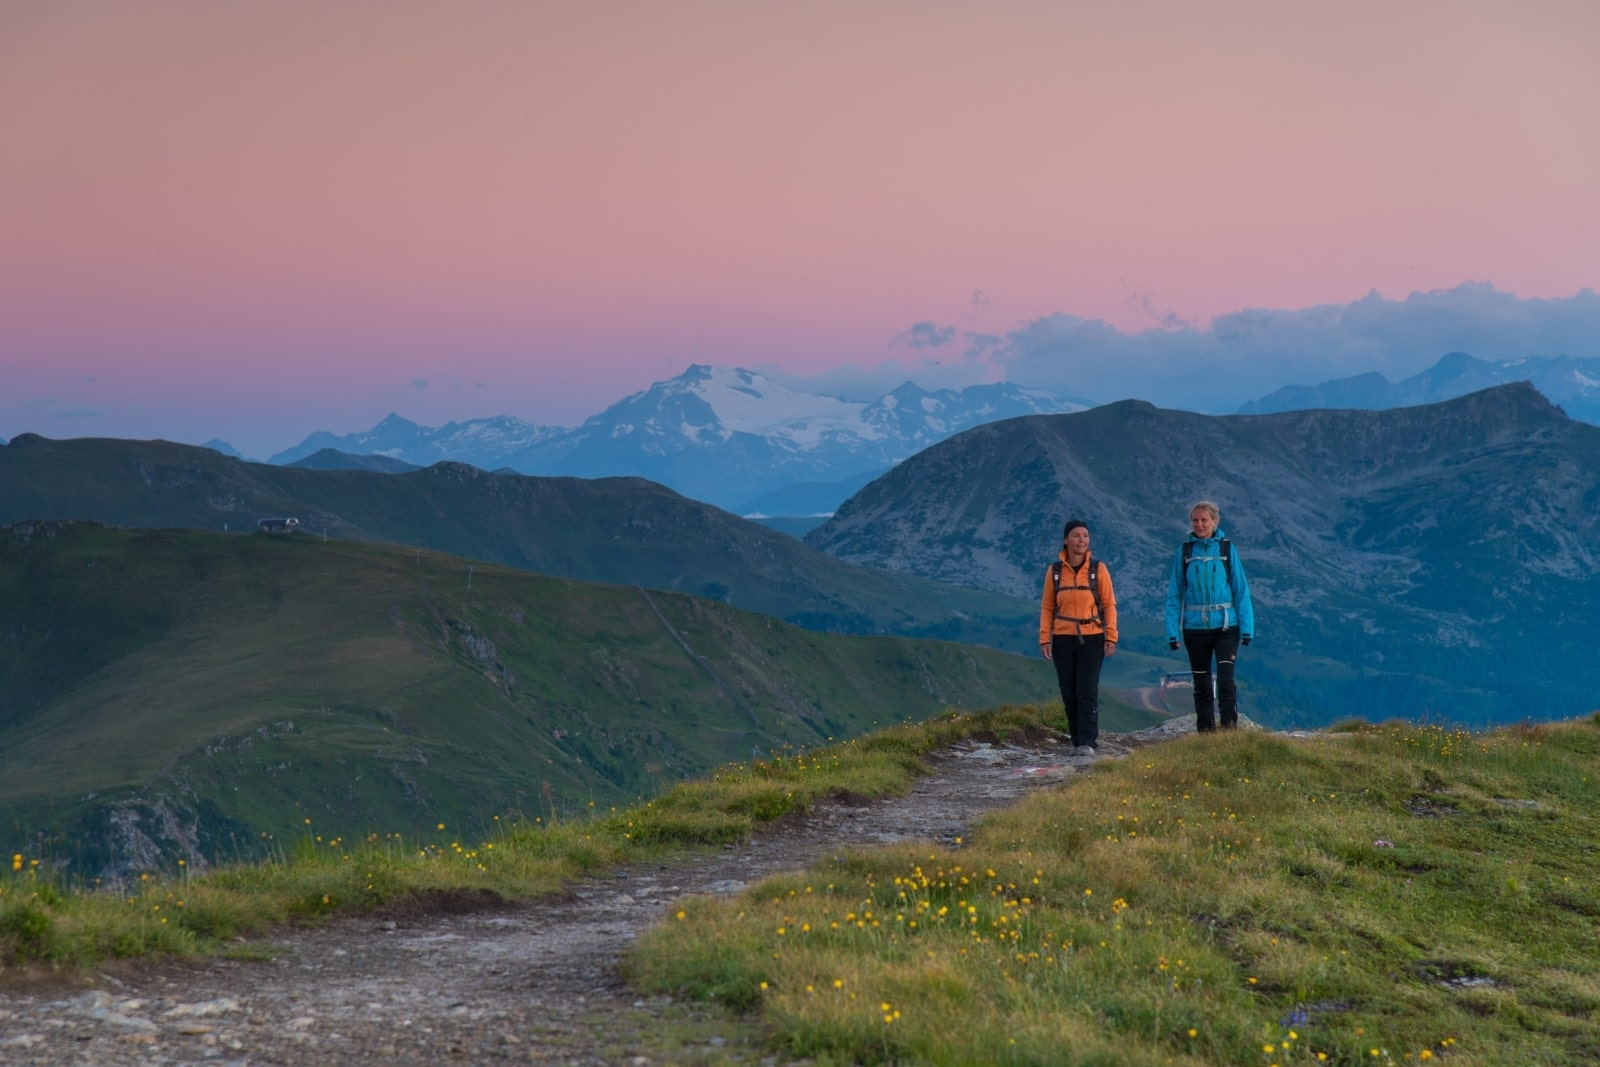 Heidi-Chalet-Falkert-Heidialm-Falkertsee-Blick-Gipfel-Abendstimmung-Gletscherblick